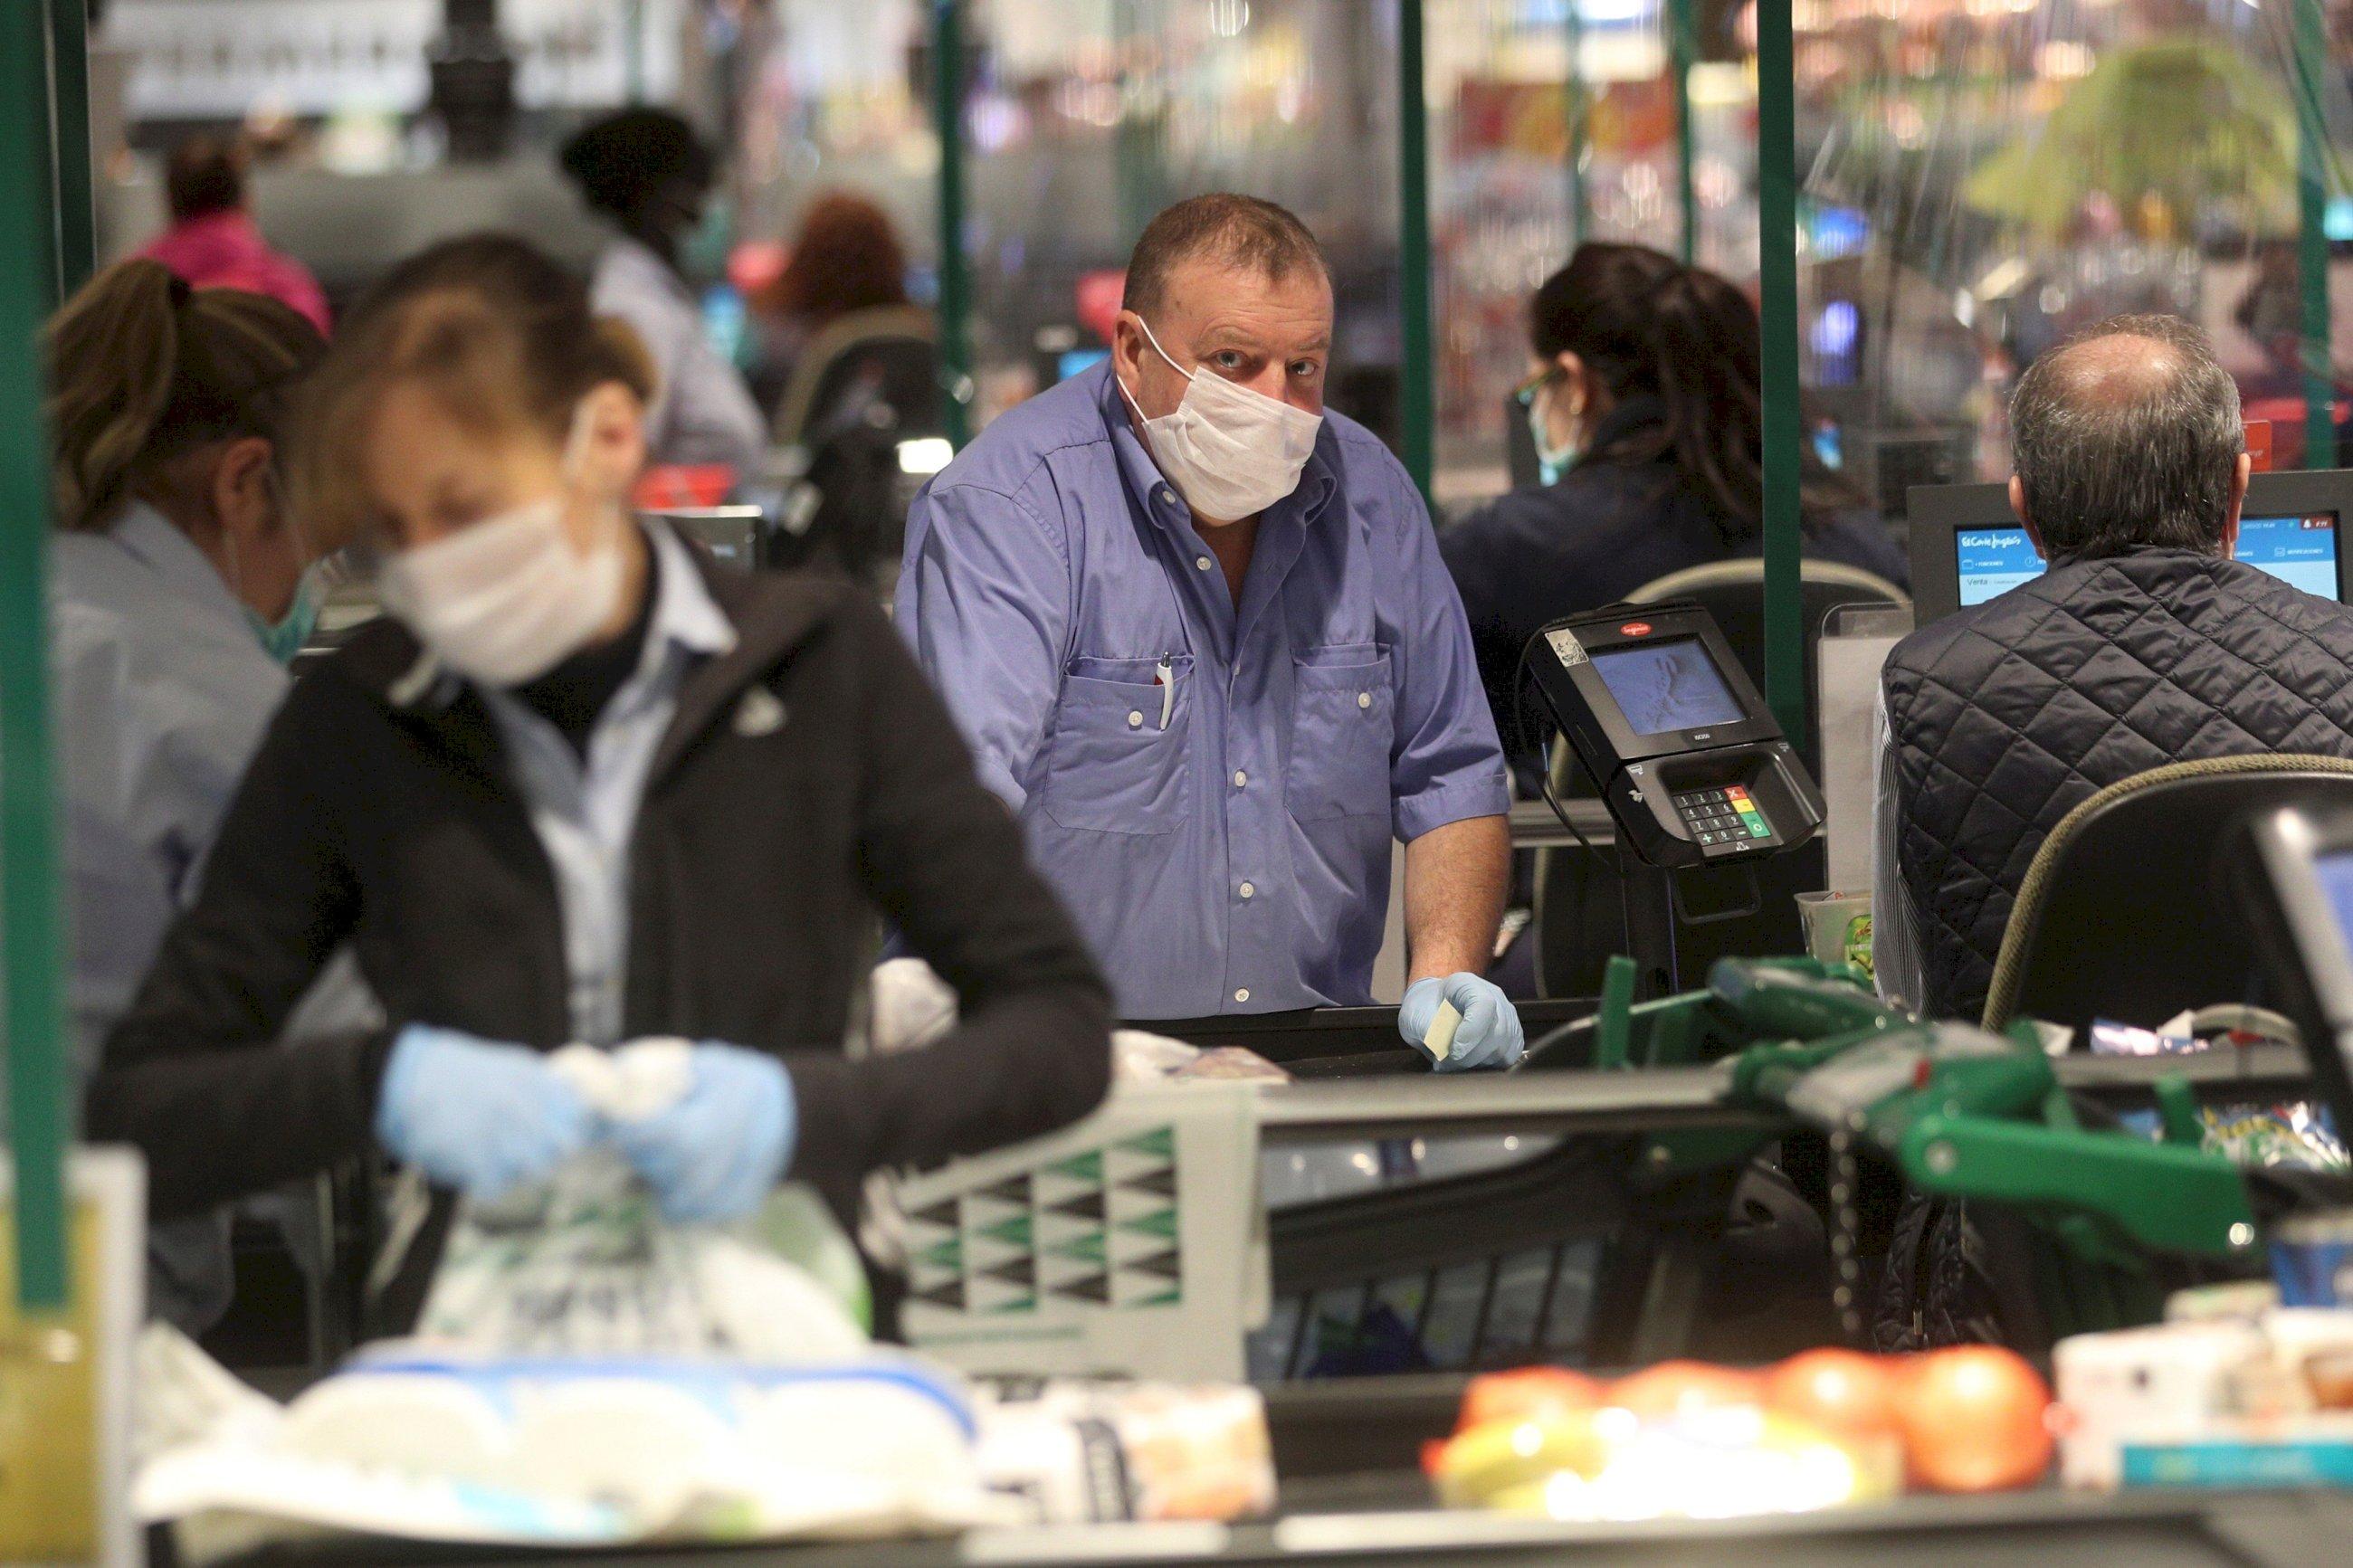 Guerra en el súper: el coronavirus refuerza a Mercadona